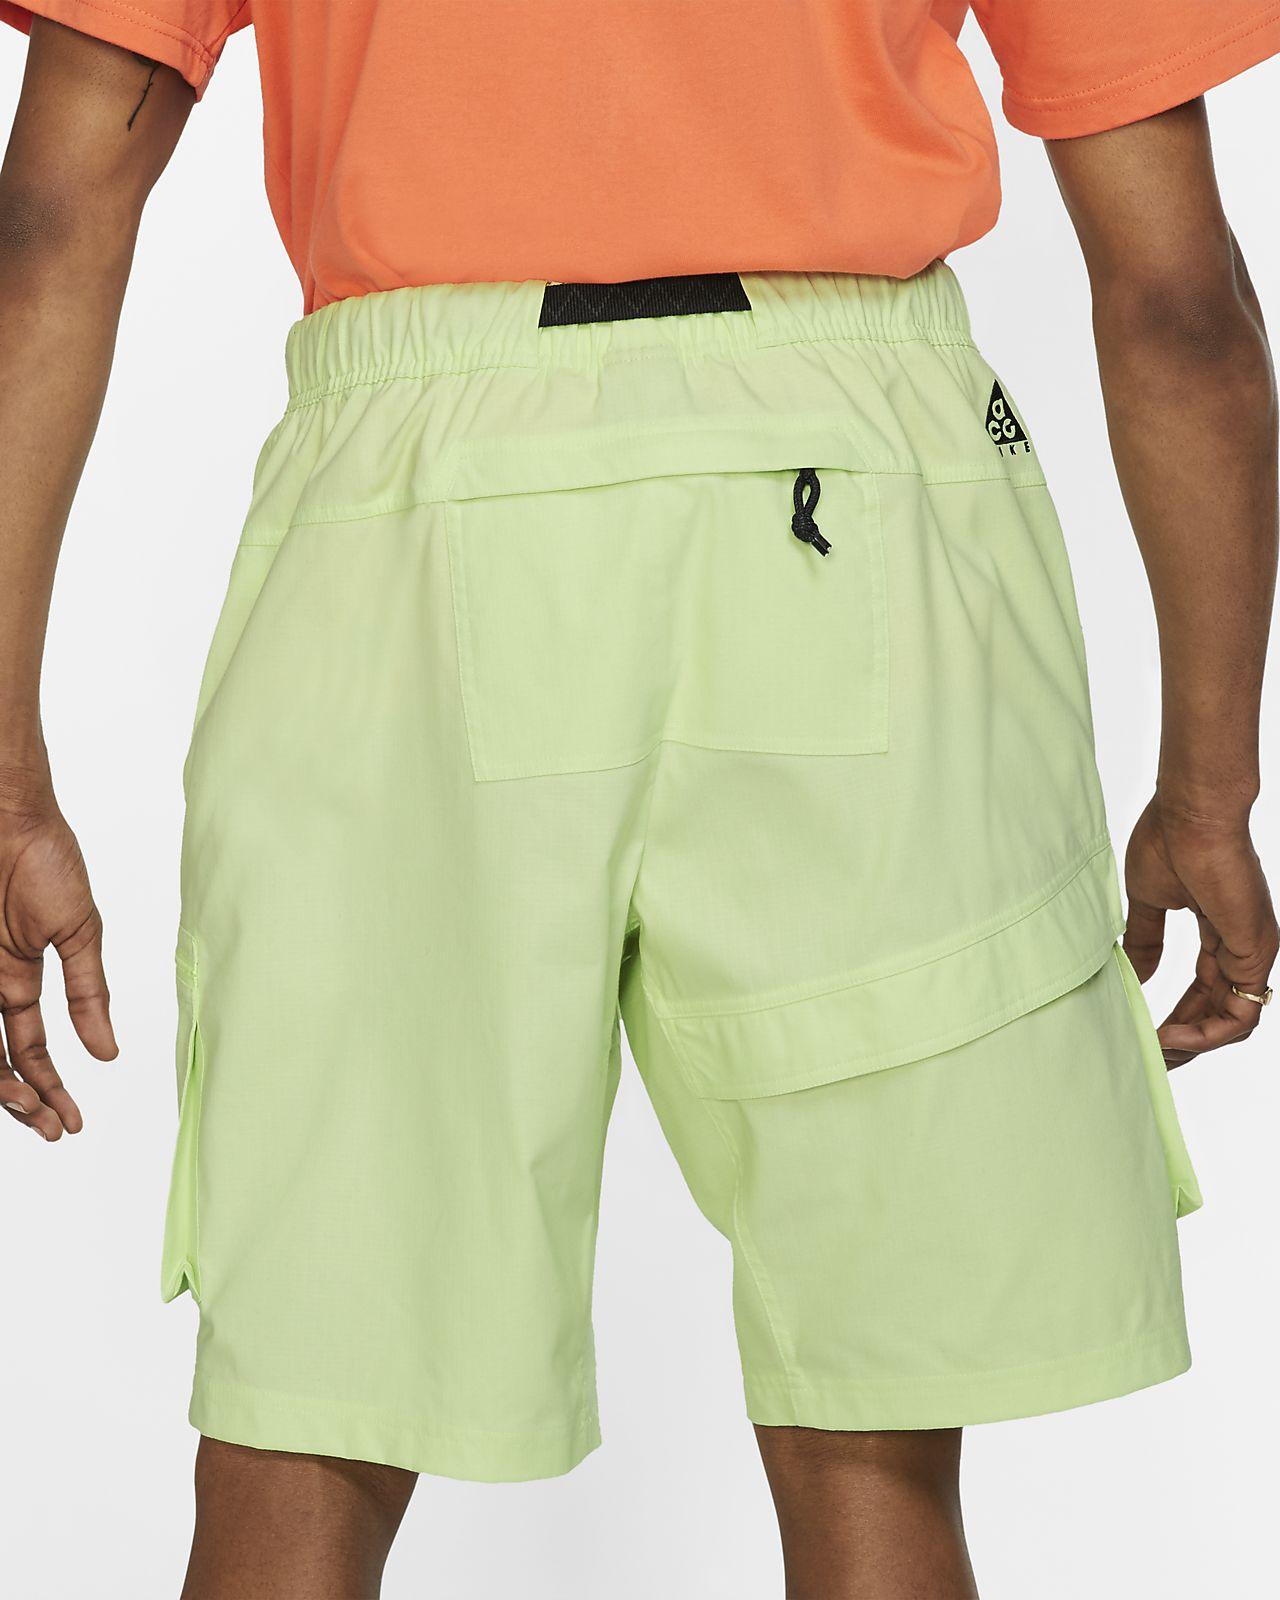 huge selection of 11e55 d8a92 Men s Cargo Shorts. Nike ACG